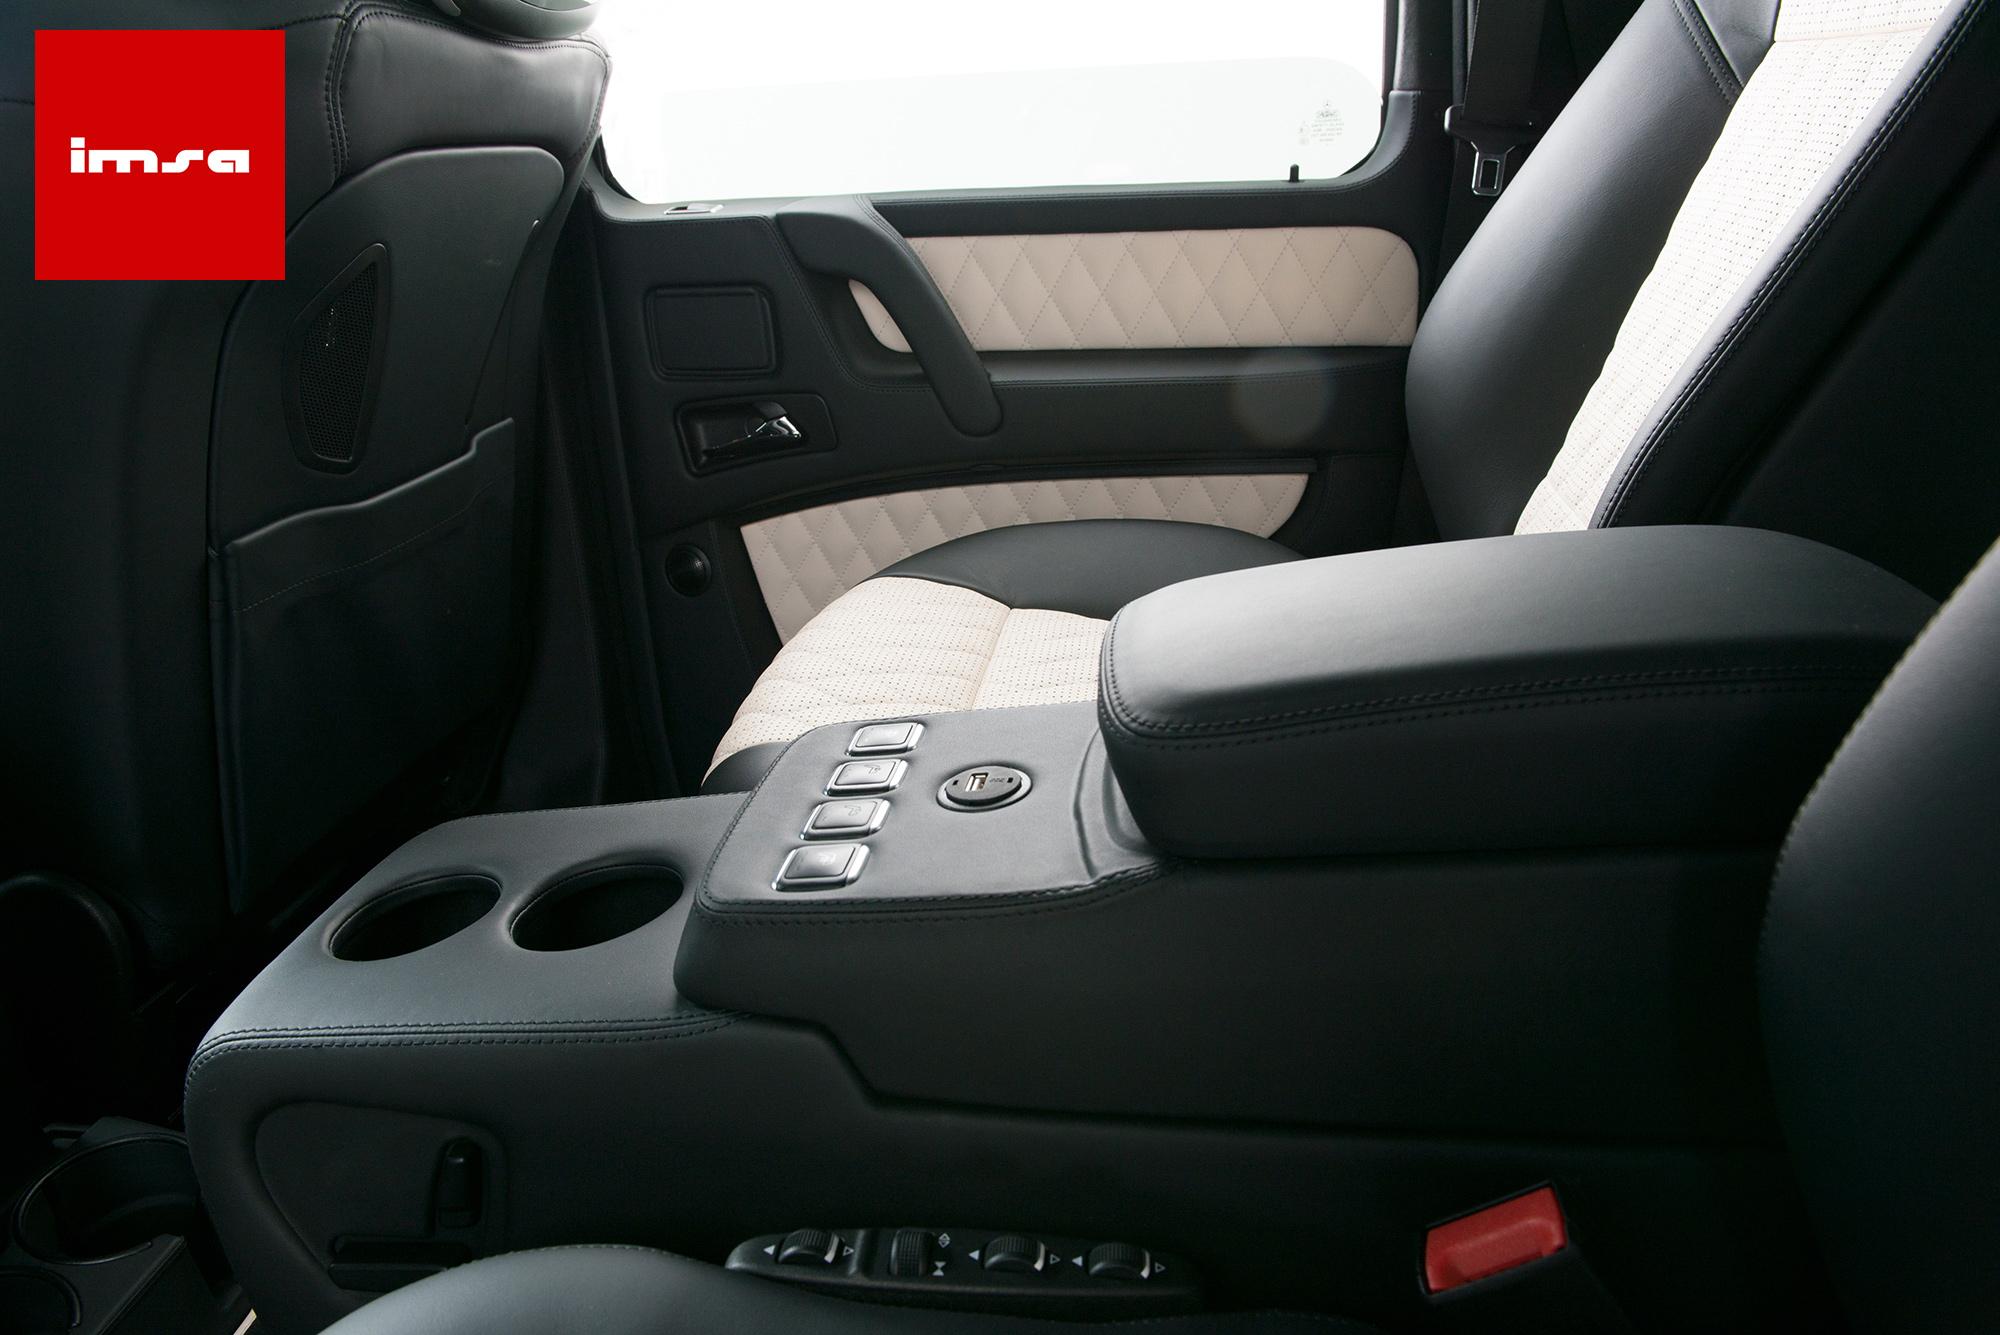 IMSA G-Class interior